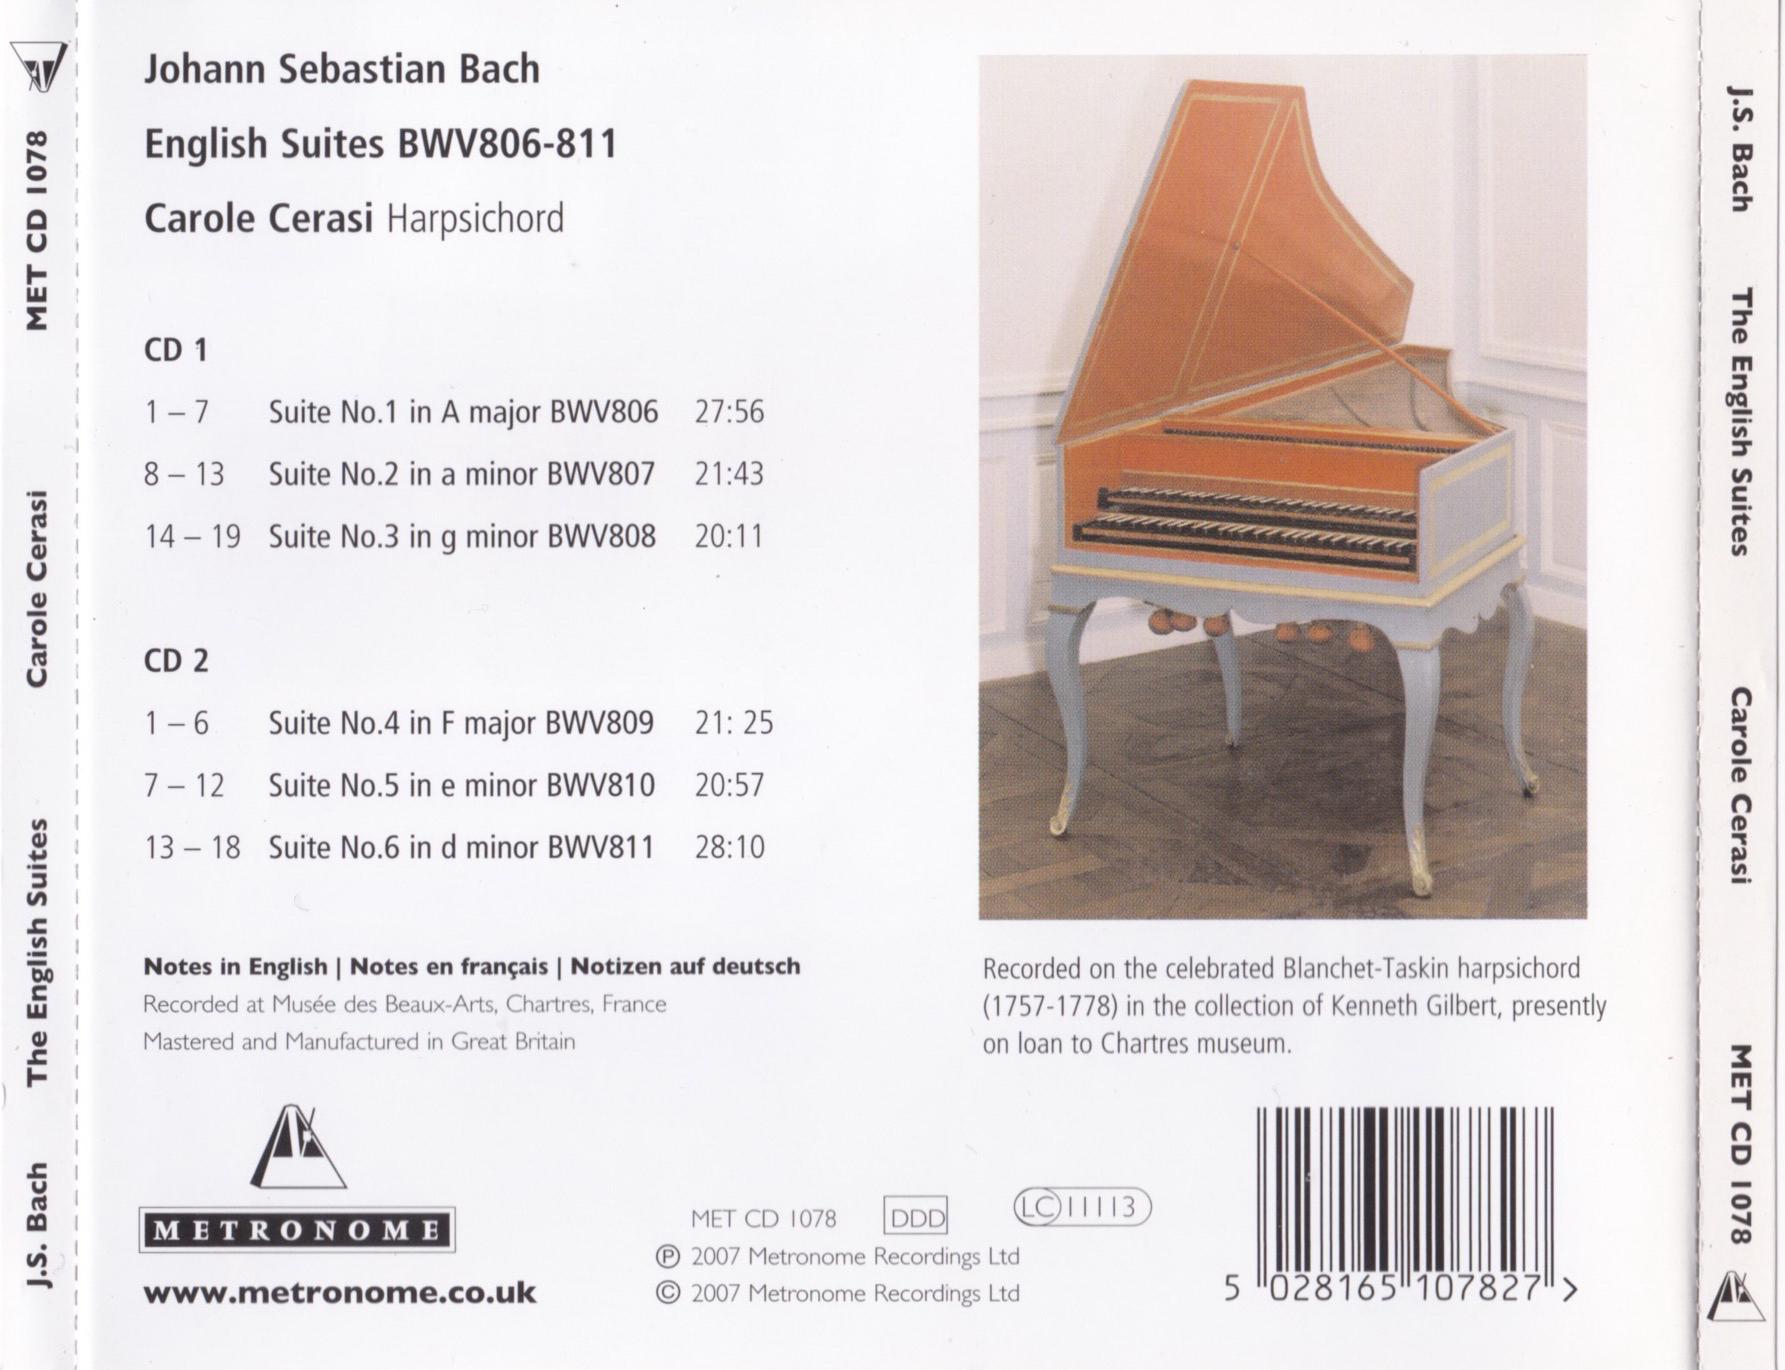 J.S. Bach - The English Suites - Carole Cerasi (2007) {2CD Set Metronome METCD 1078}